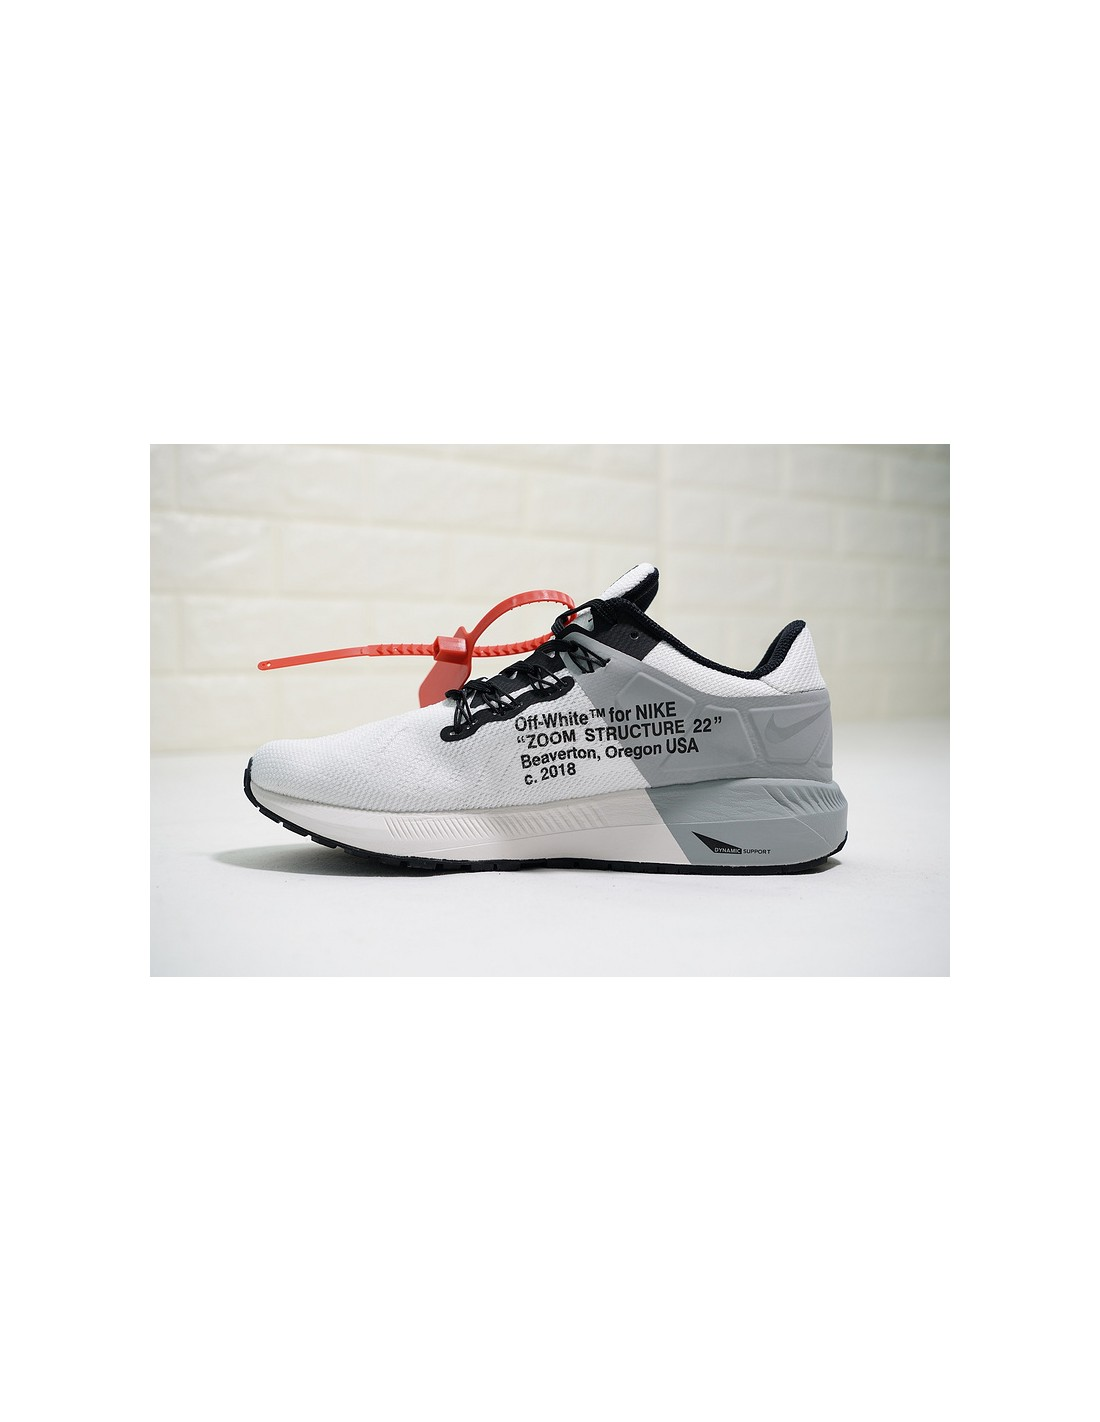 0fe0edfc1de58 Home · Air Zoom Structure 22 x Off-White Custom. Previous. Next. Reduced  price. Previous. Next. Nike